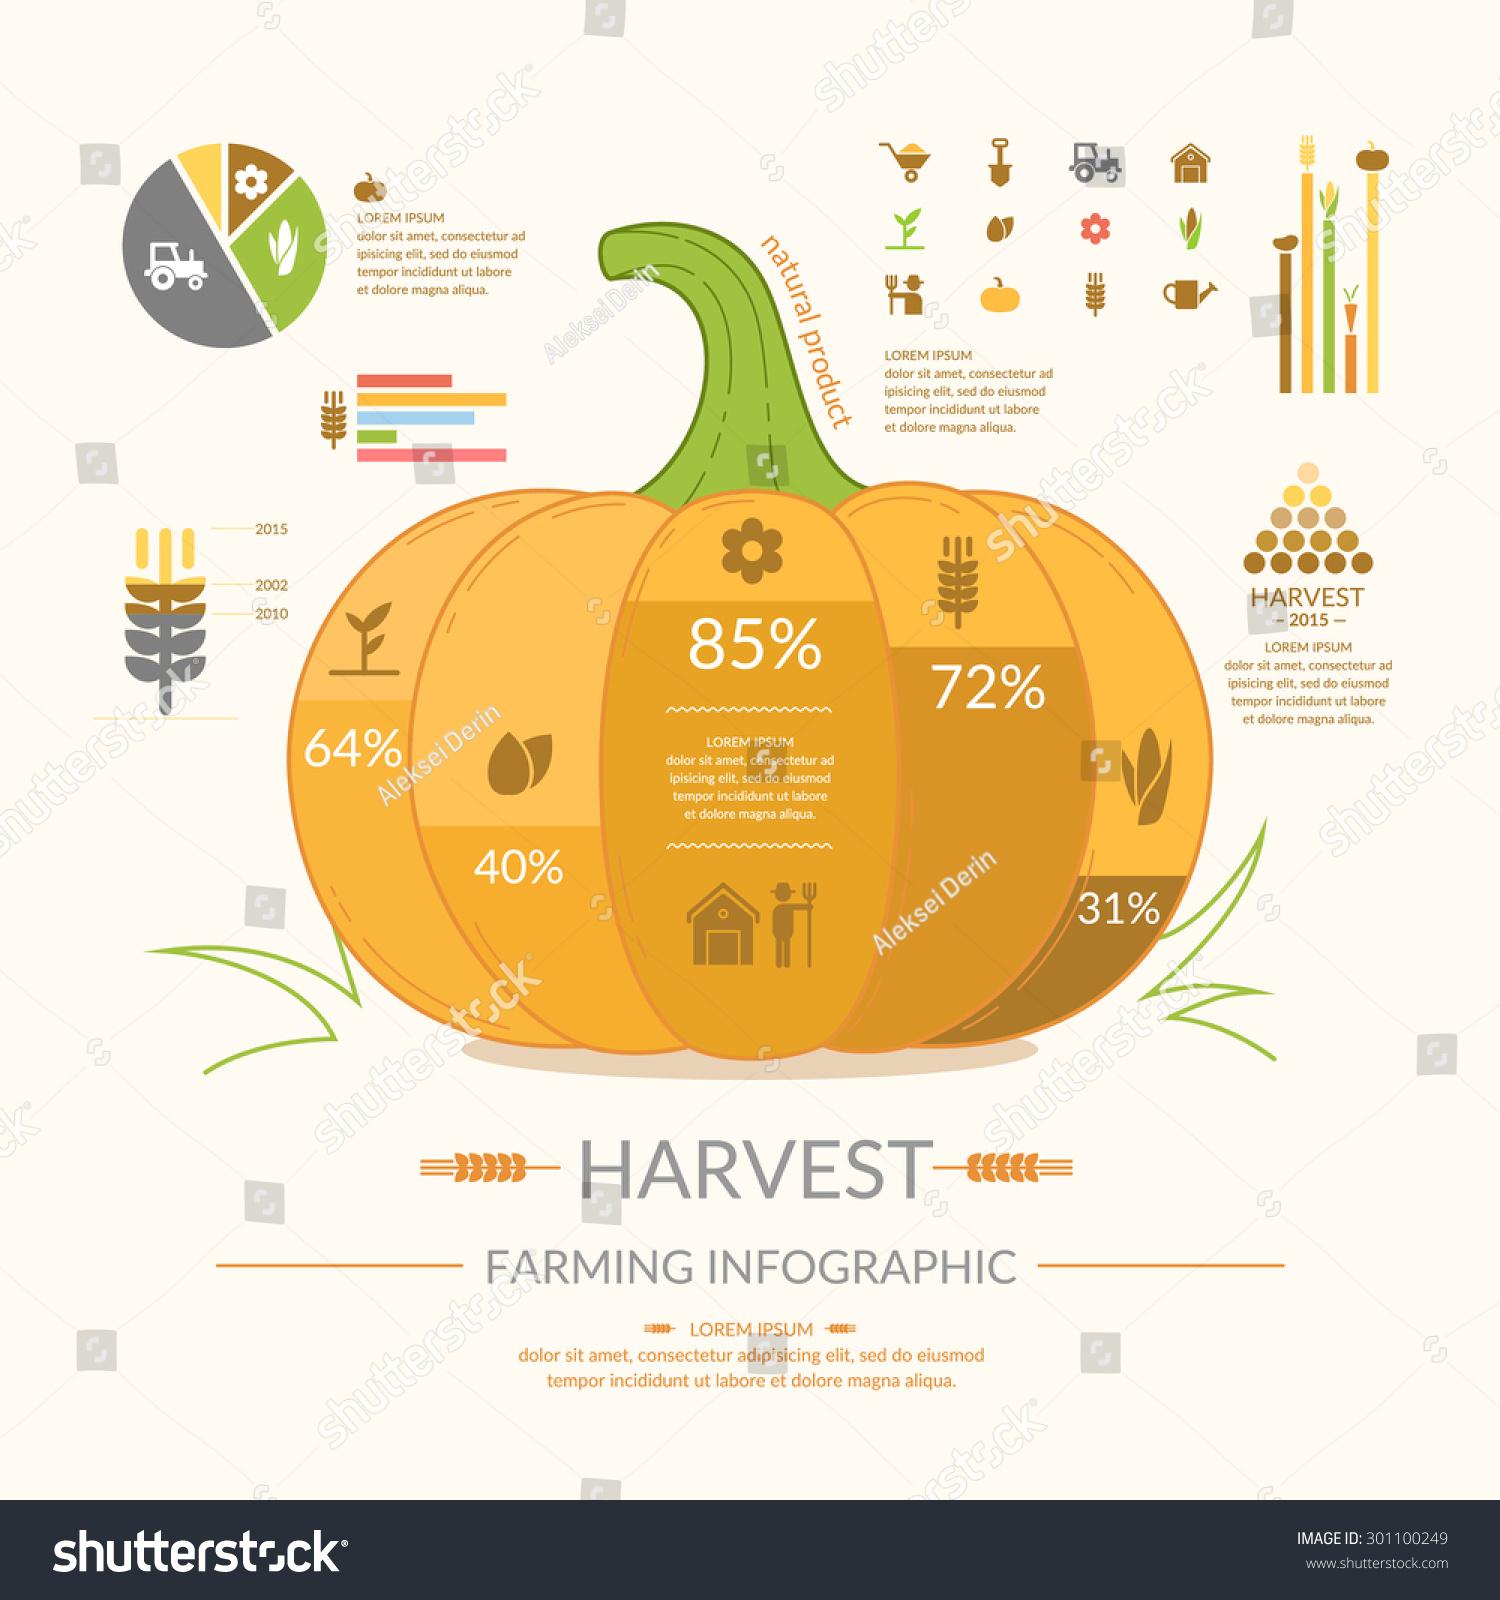 Harvest Farming Infographics Icons Illustrations Design Stock ...